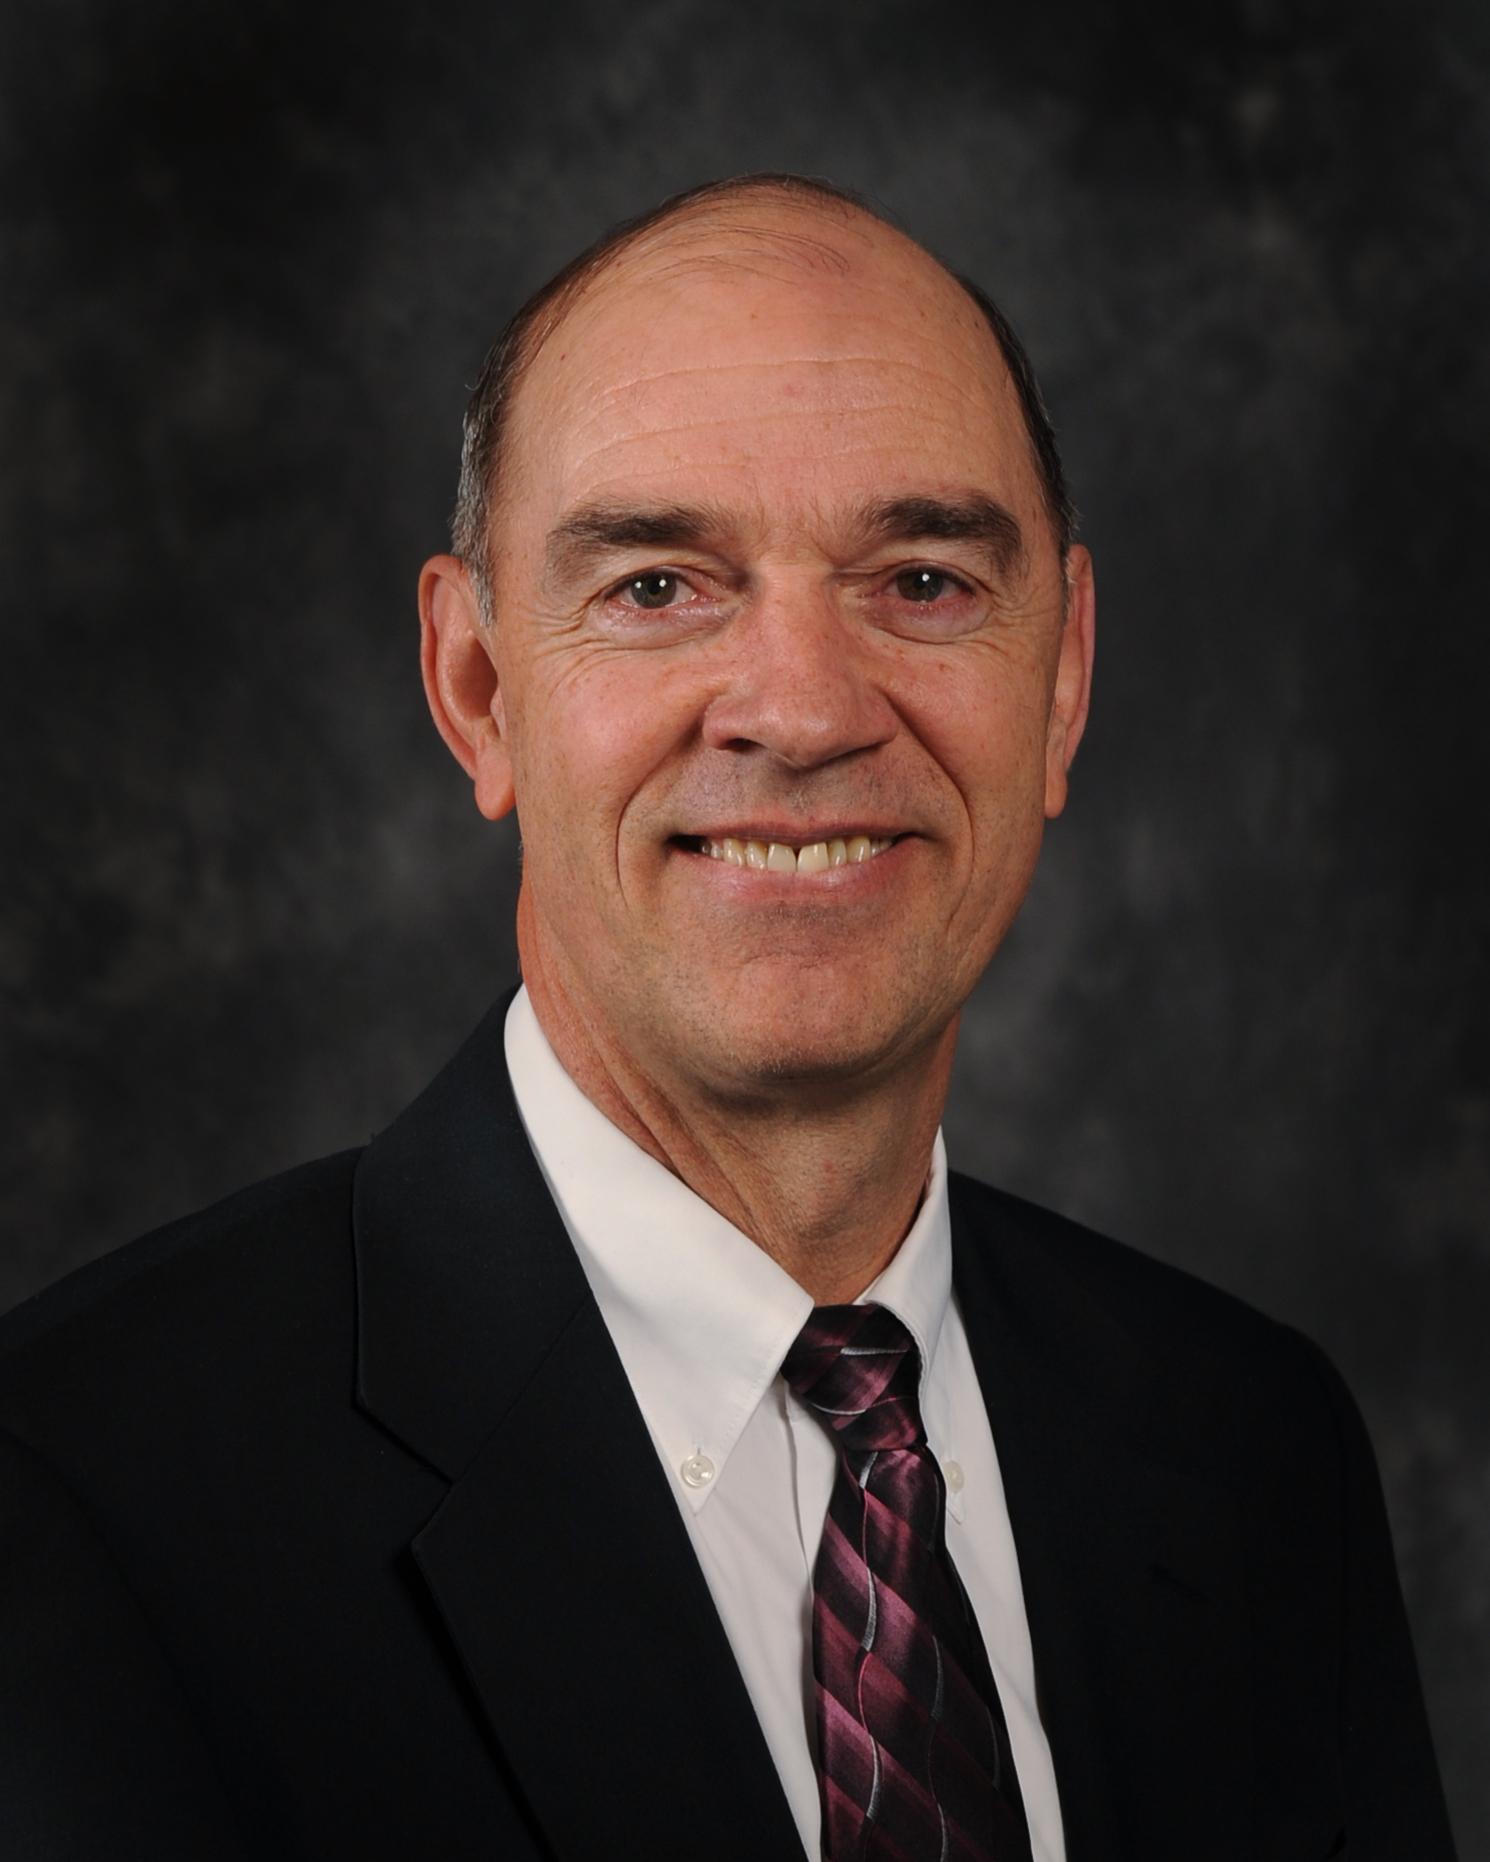 Senior Partner Kenneth Hinton to Retire from HintonBurdick CPAs & Advisors